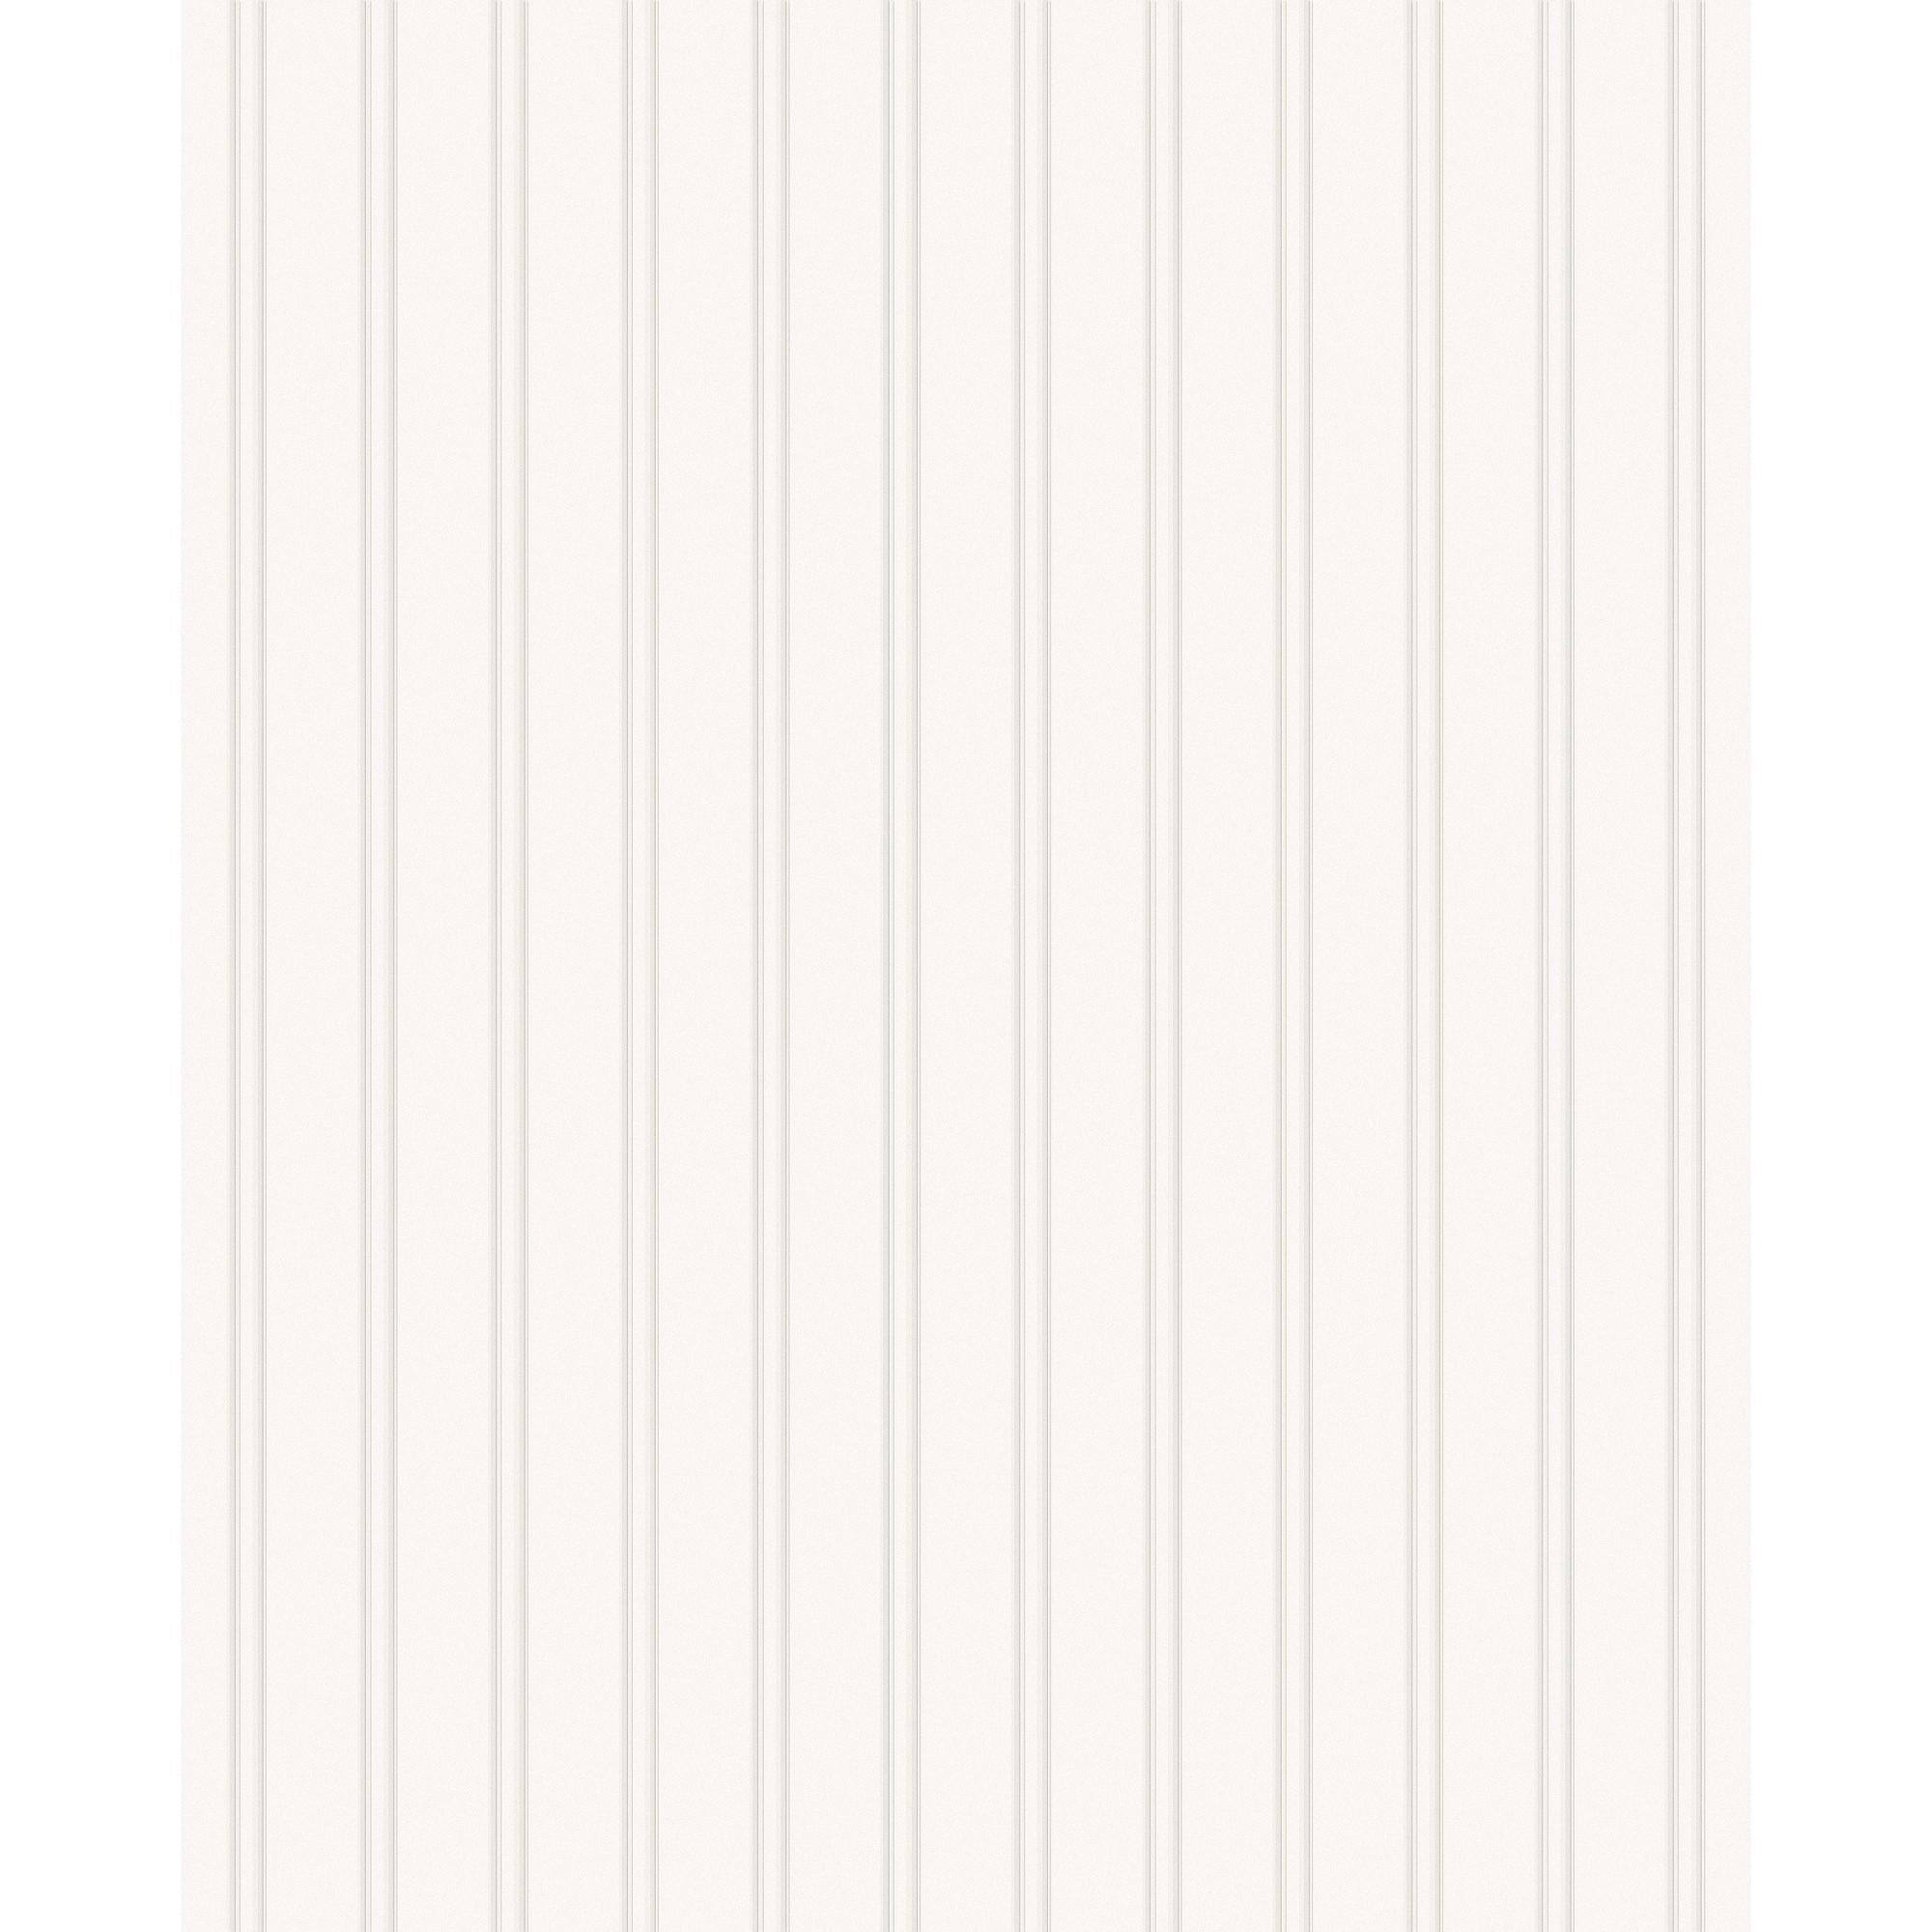 Beadboard Paintable Wallpaper in 2019 White beadboard